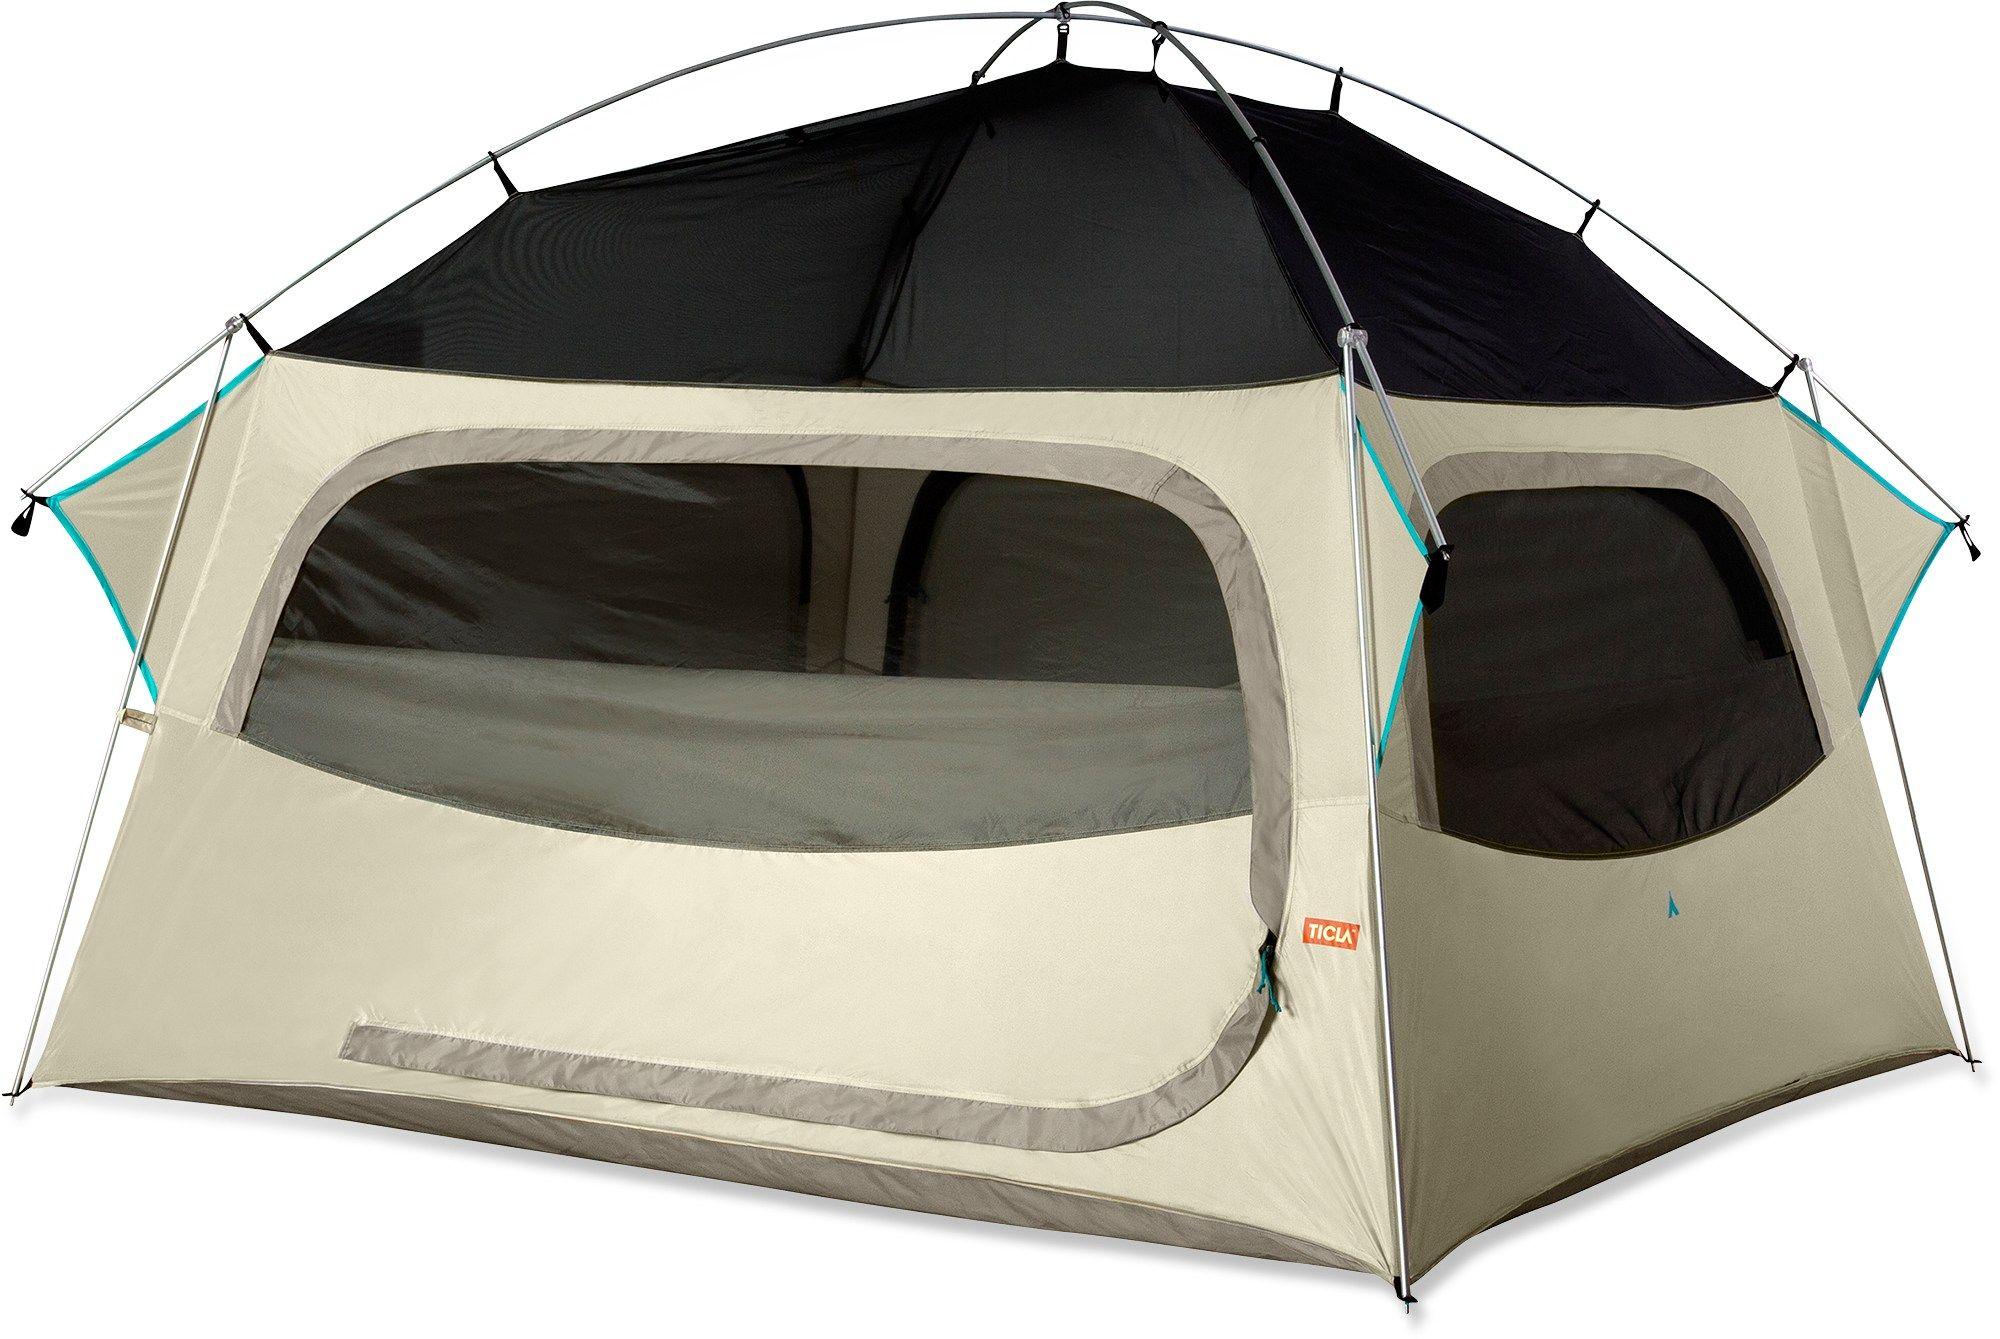 Ticla TeaHouse 3 Tent - 2014 Closeout - REI.com  sc 1 st  Pinterest & Ticla TeaHouse 3 Tent - 2014 Closeout - REI.com   the great ...